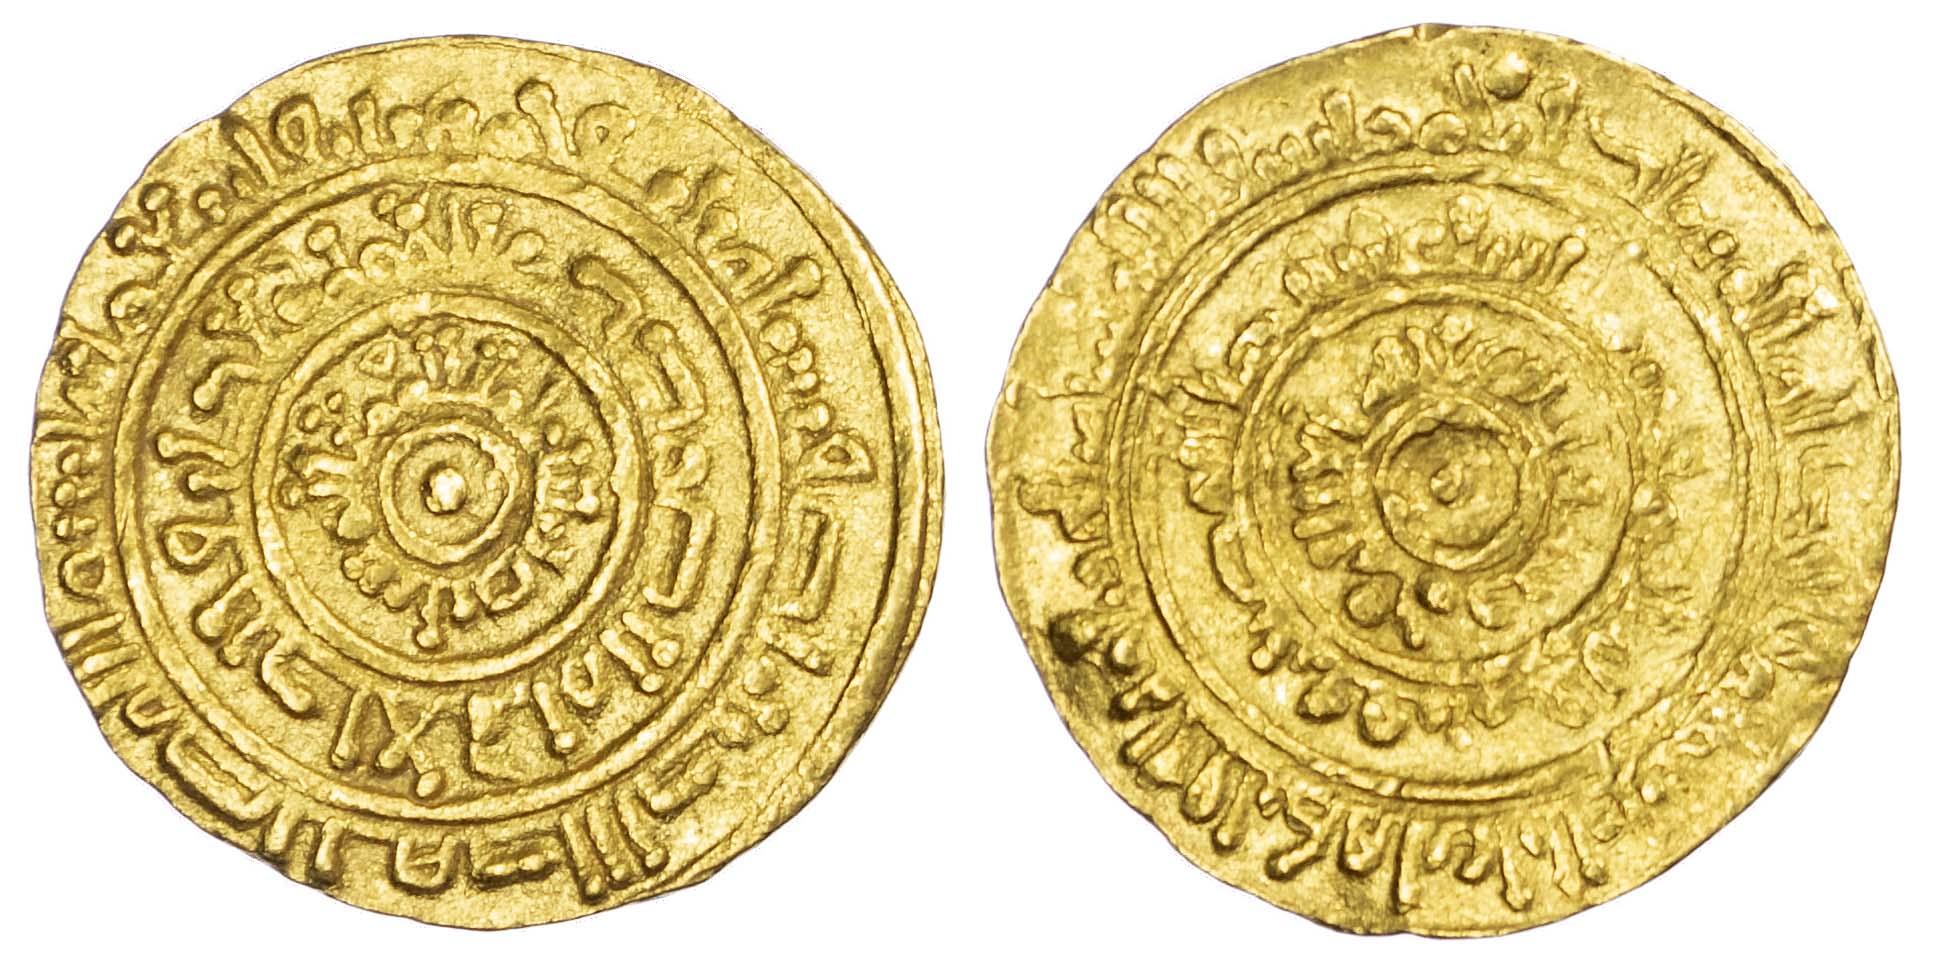 Egypt, Fatimid, Al-Mustansir (AH427-487 / 1036-1094 AD), gold Dinar